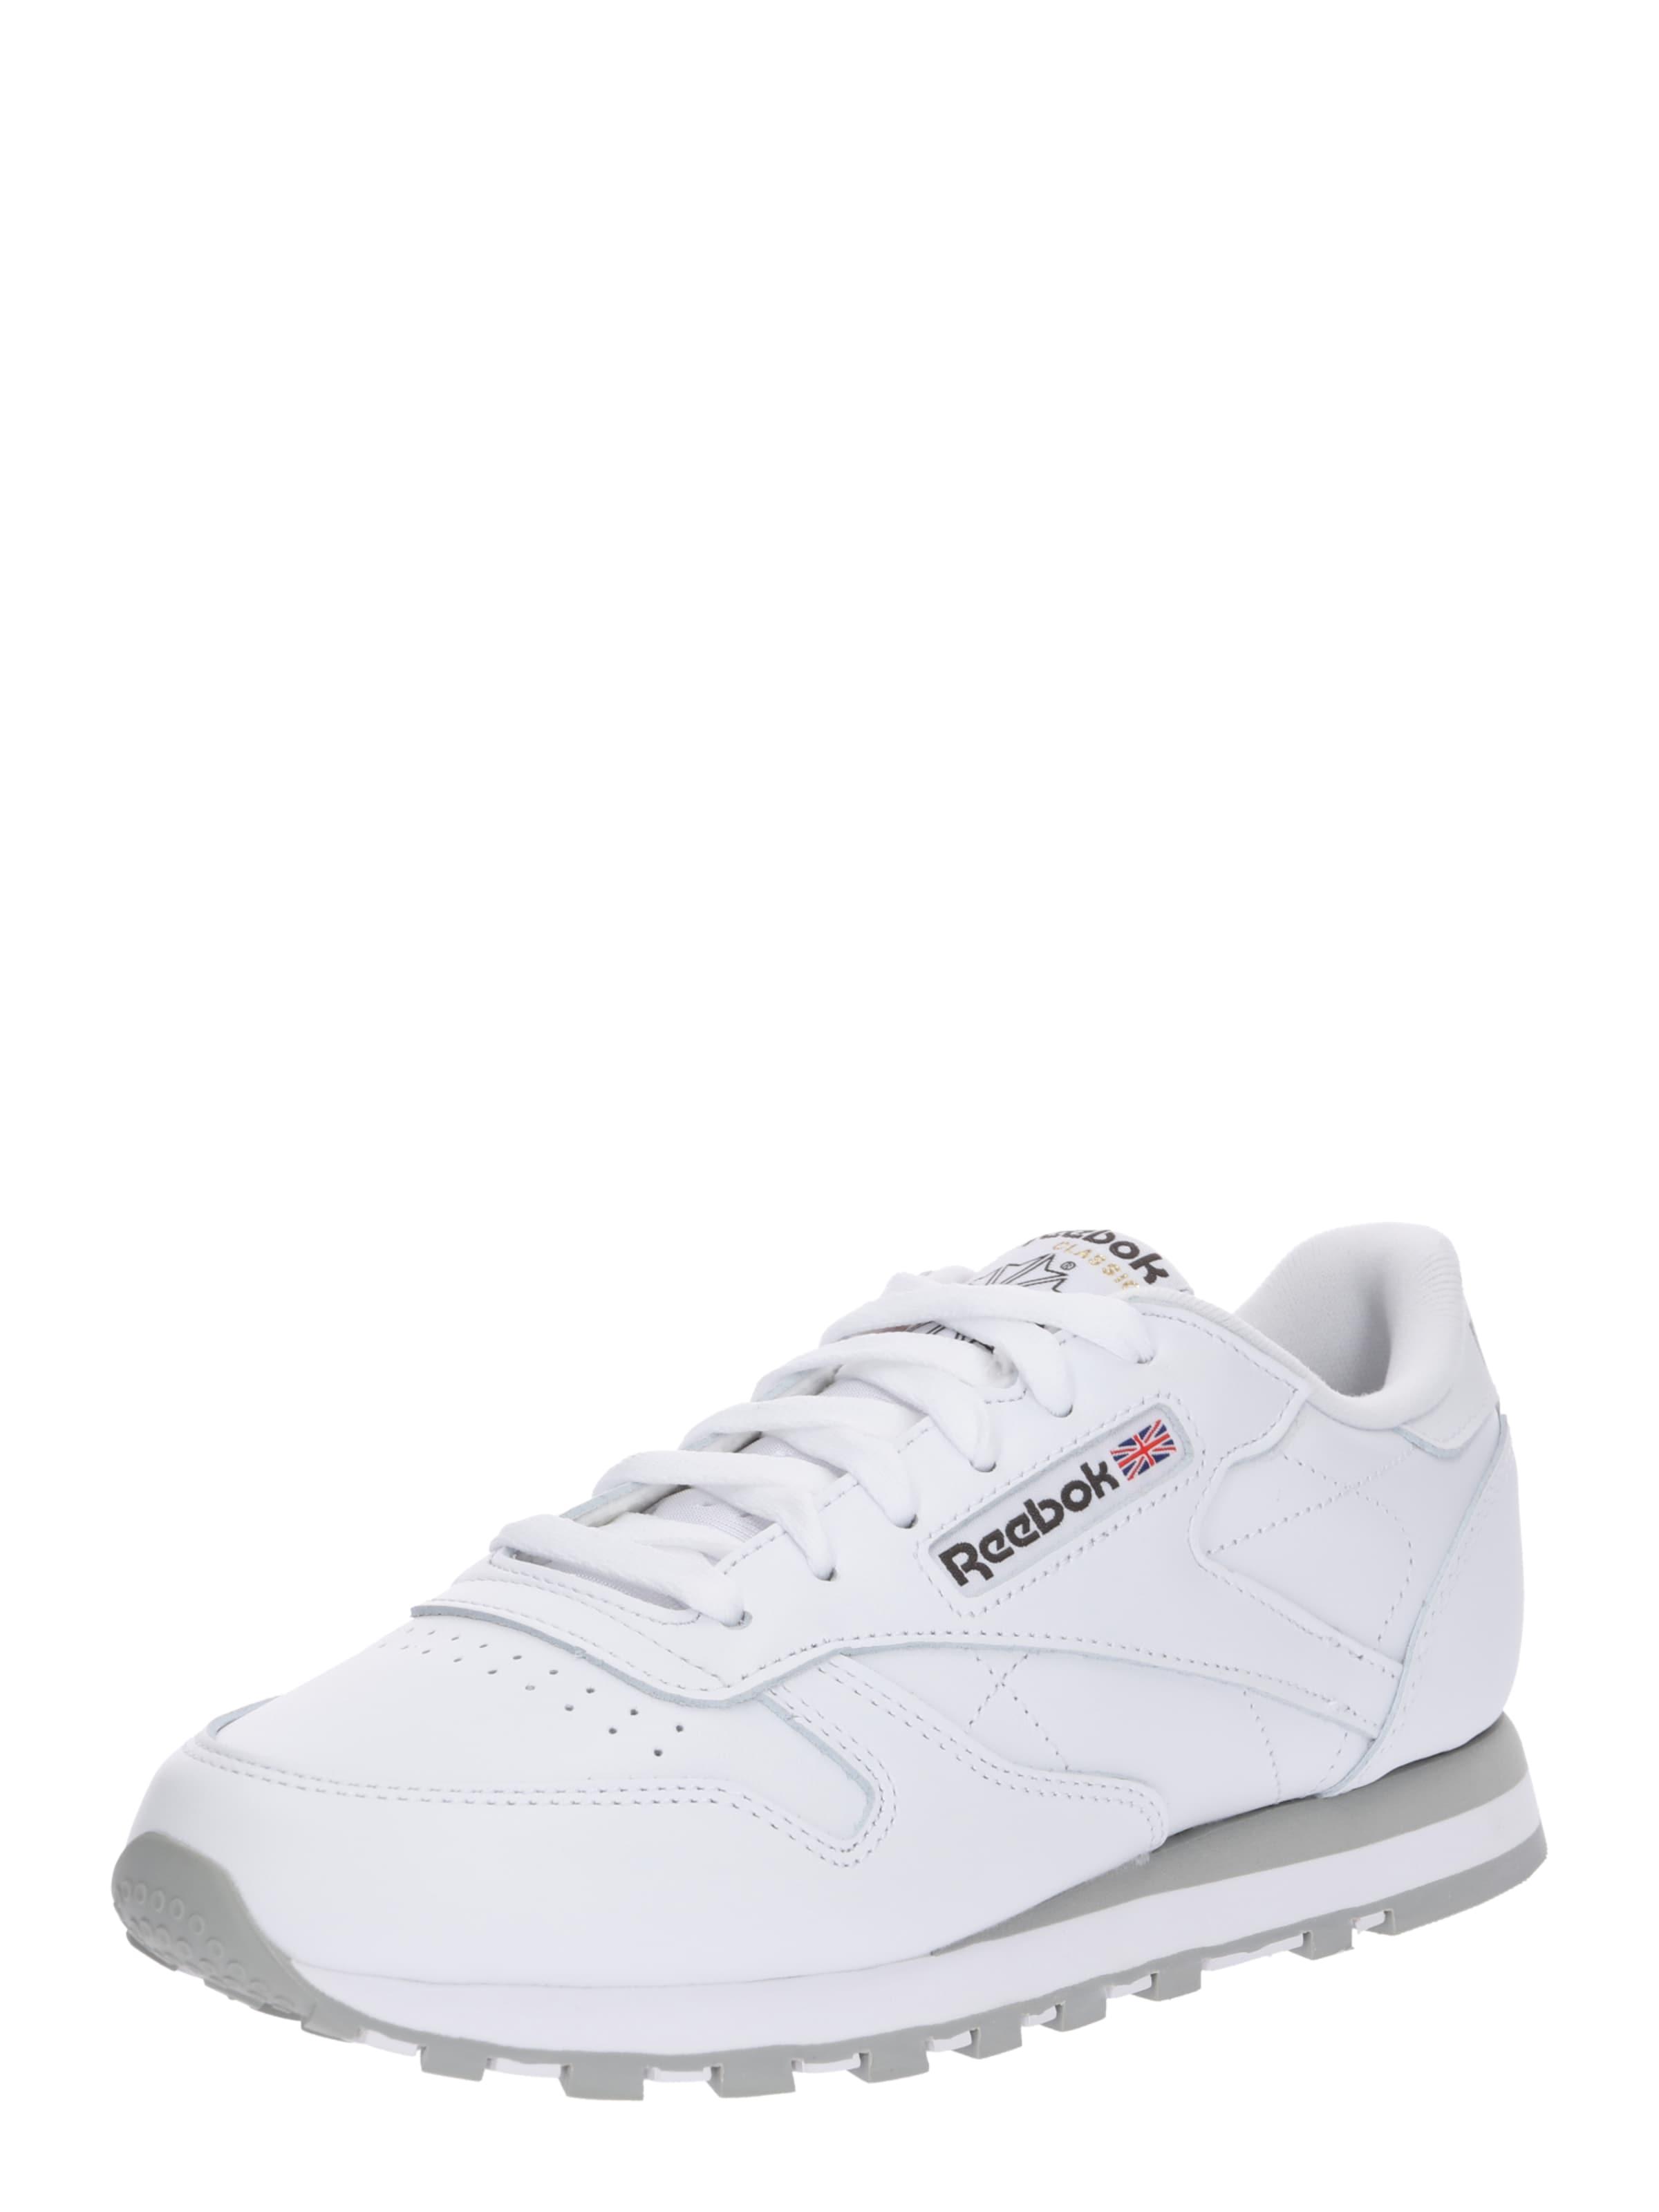 In Lthr' HellgrauWeiß Reebok Sneaker Classic 'cl TFlK315uJc